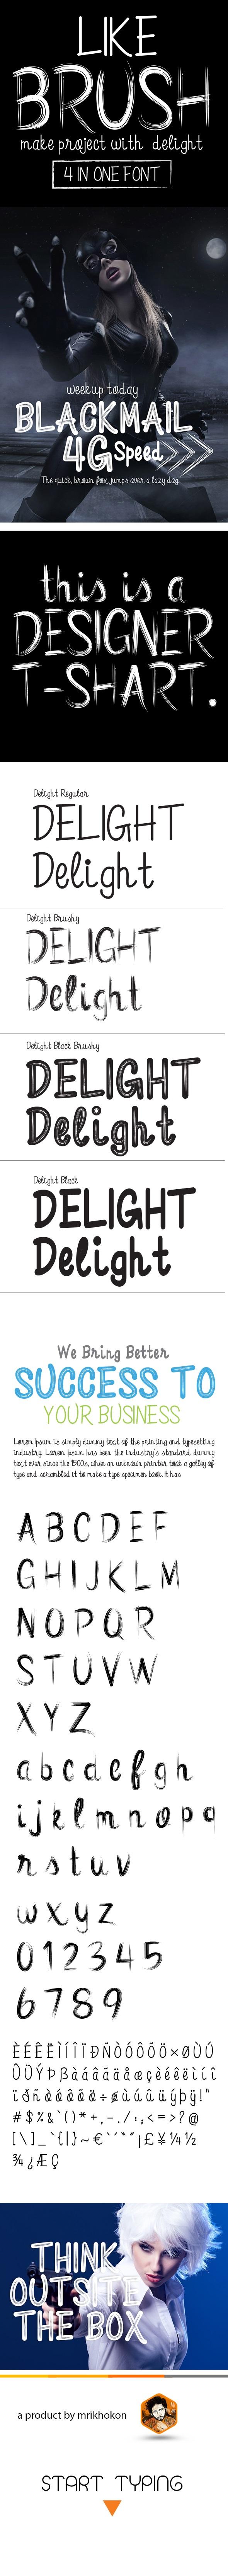 Free Font Delight Font Download